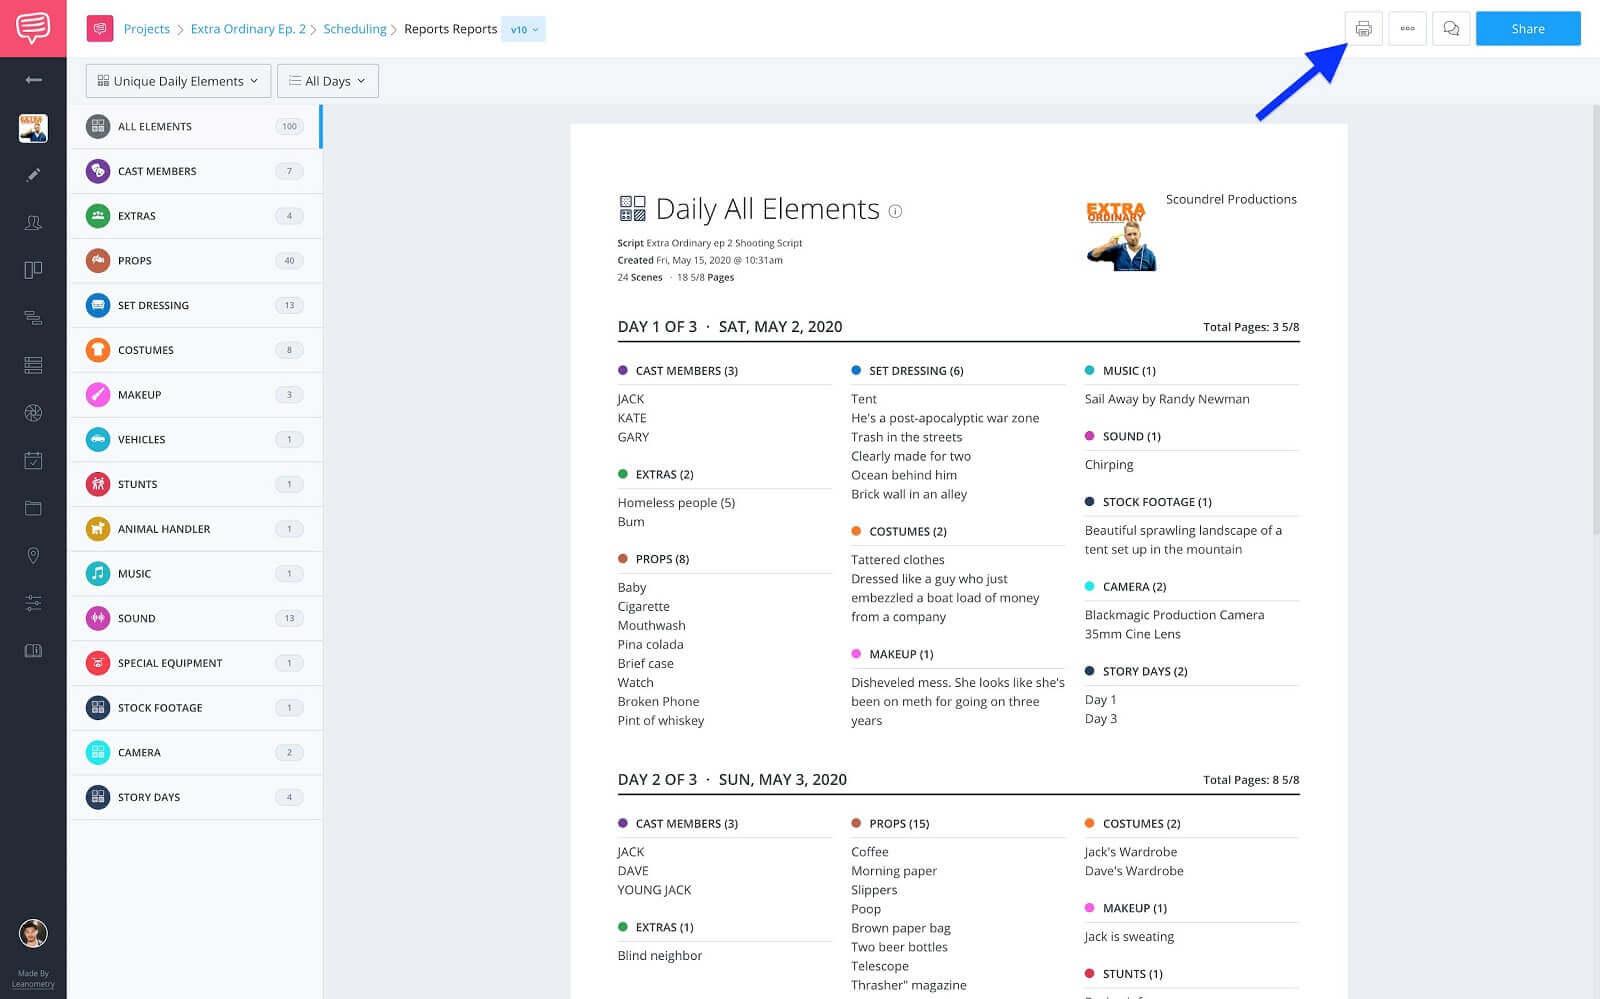 Unique Daily Elements Report - Click print on toolbar